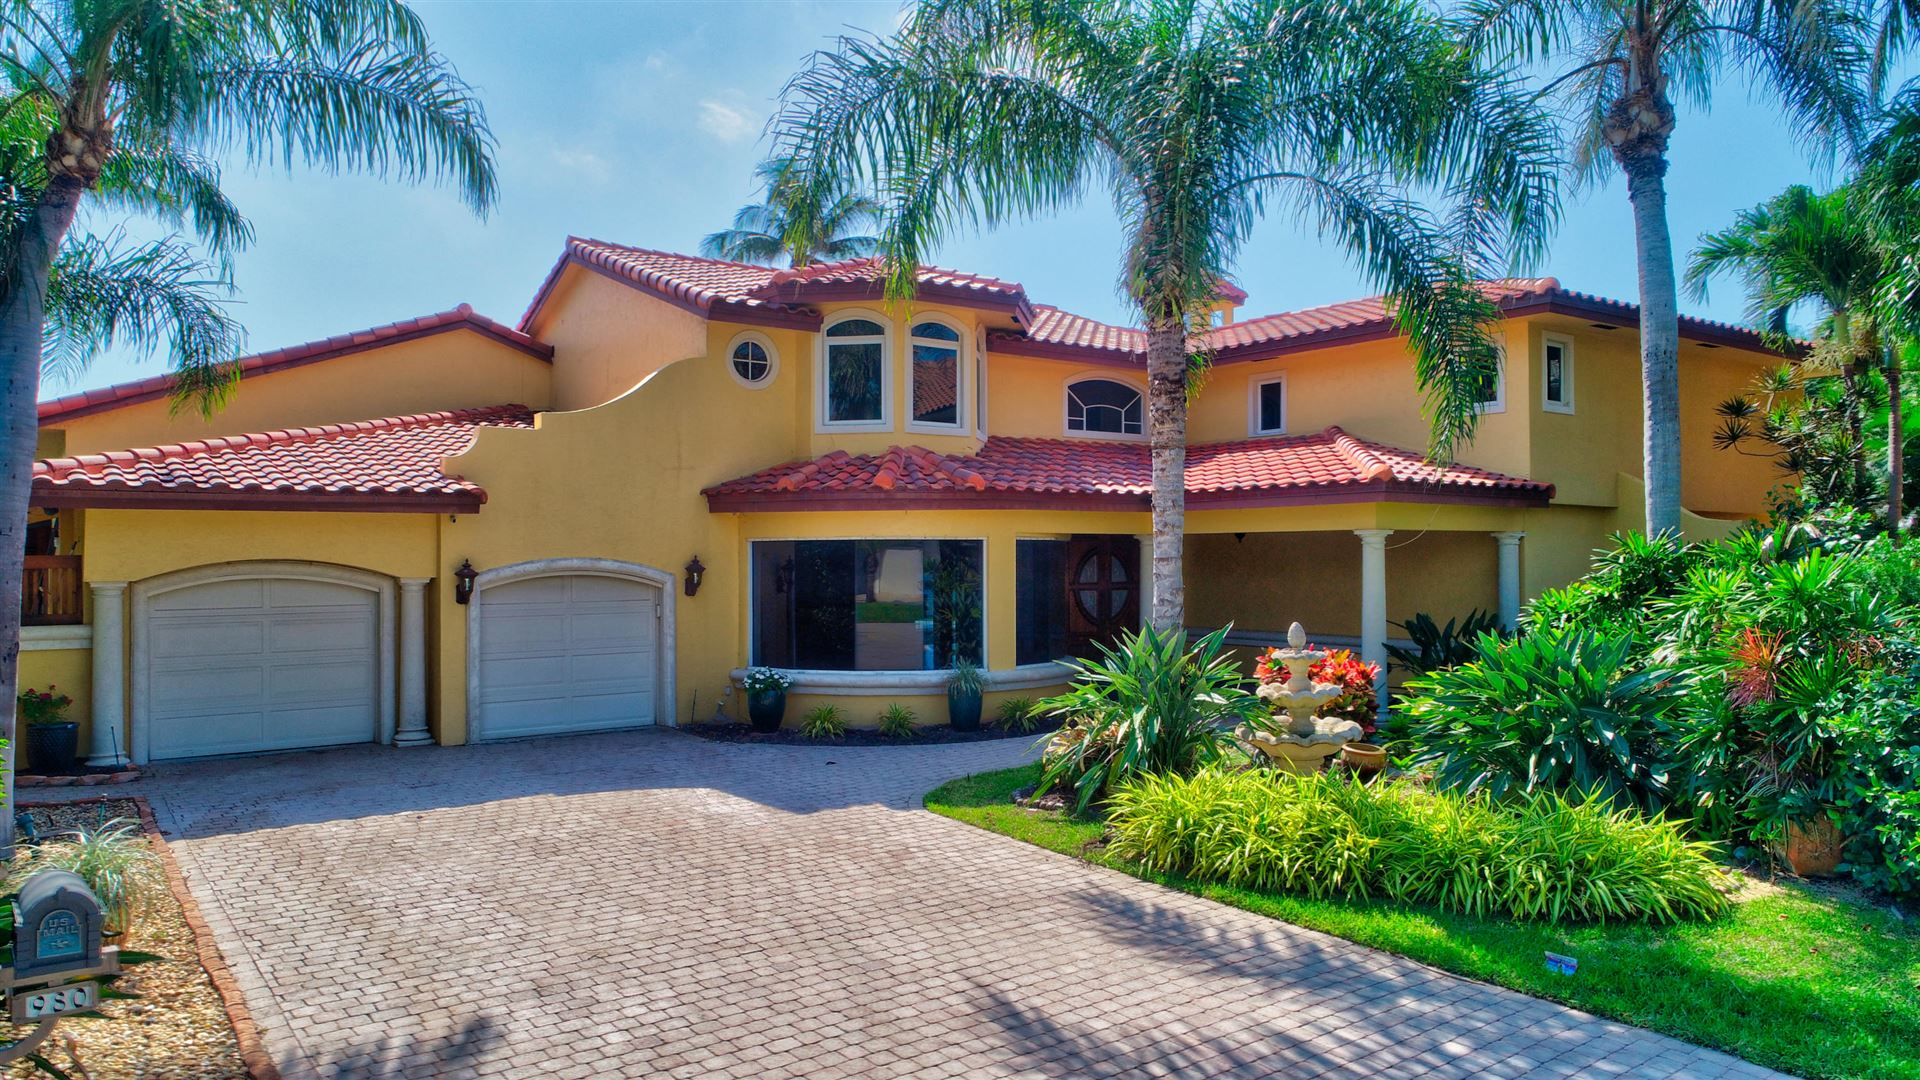 Photo of 980 Evergreen Drive, Delray Beach, FL 33483 (MLS # RX-10708810)